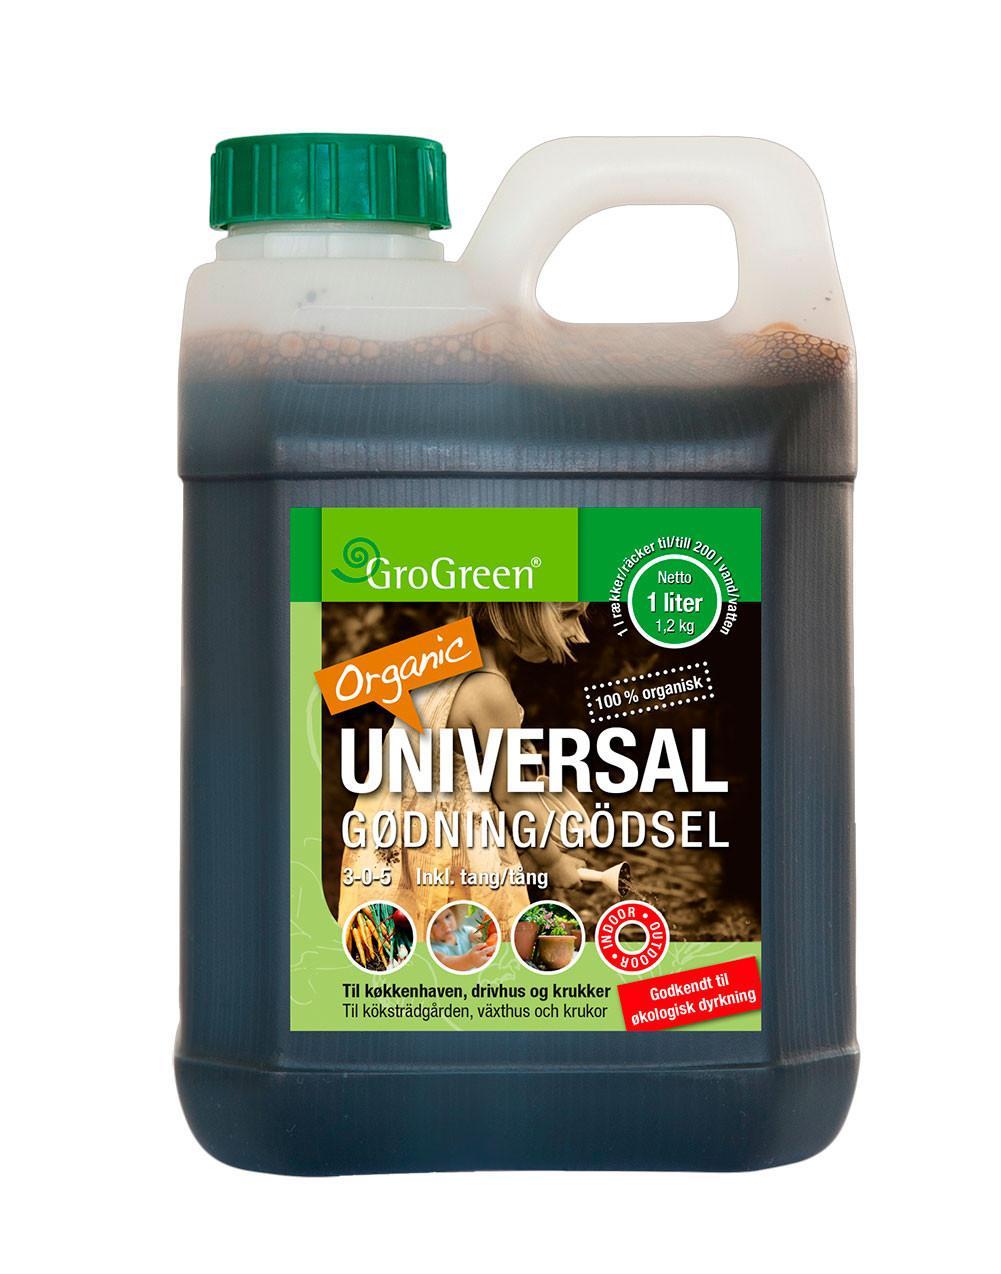 GroGreen Bio Universal gødning - NPK 3-0-5 - 1 liter